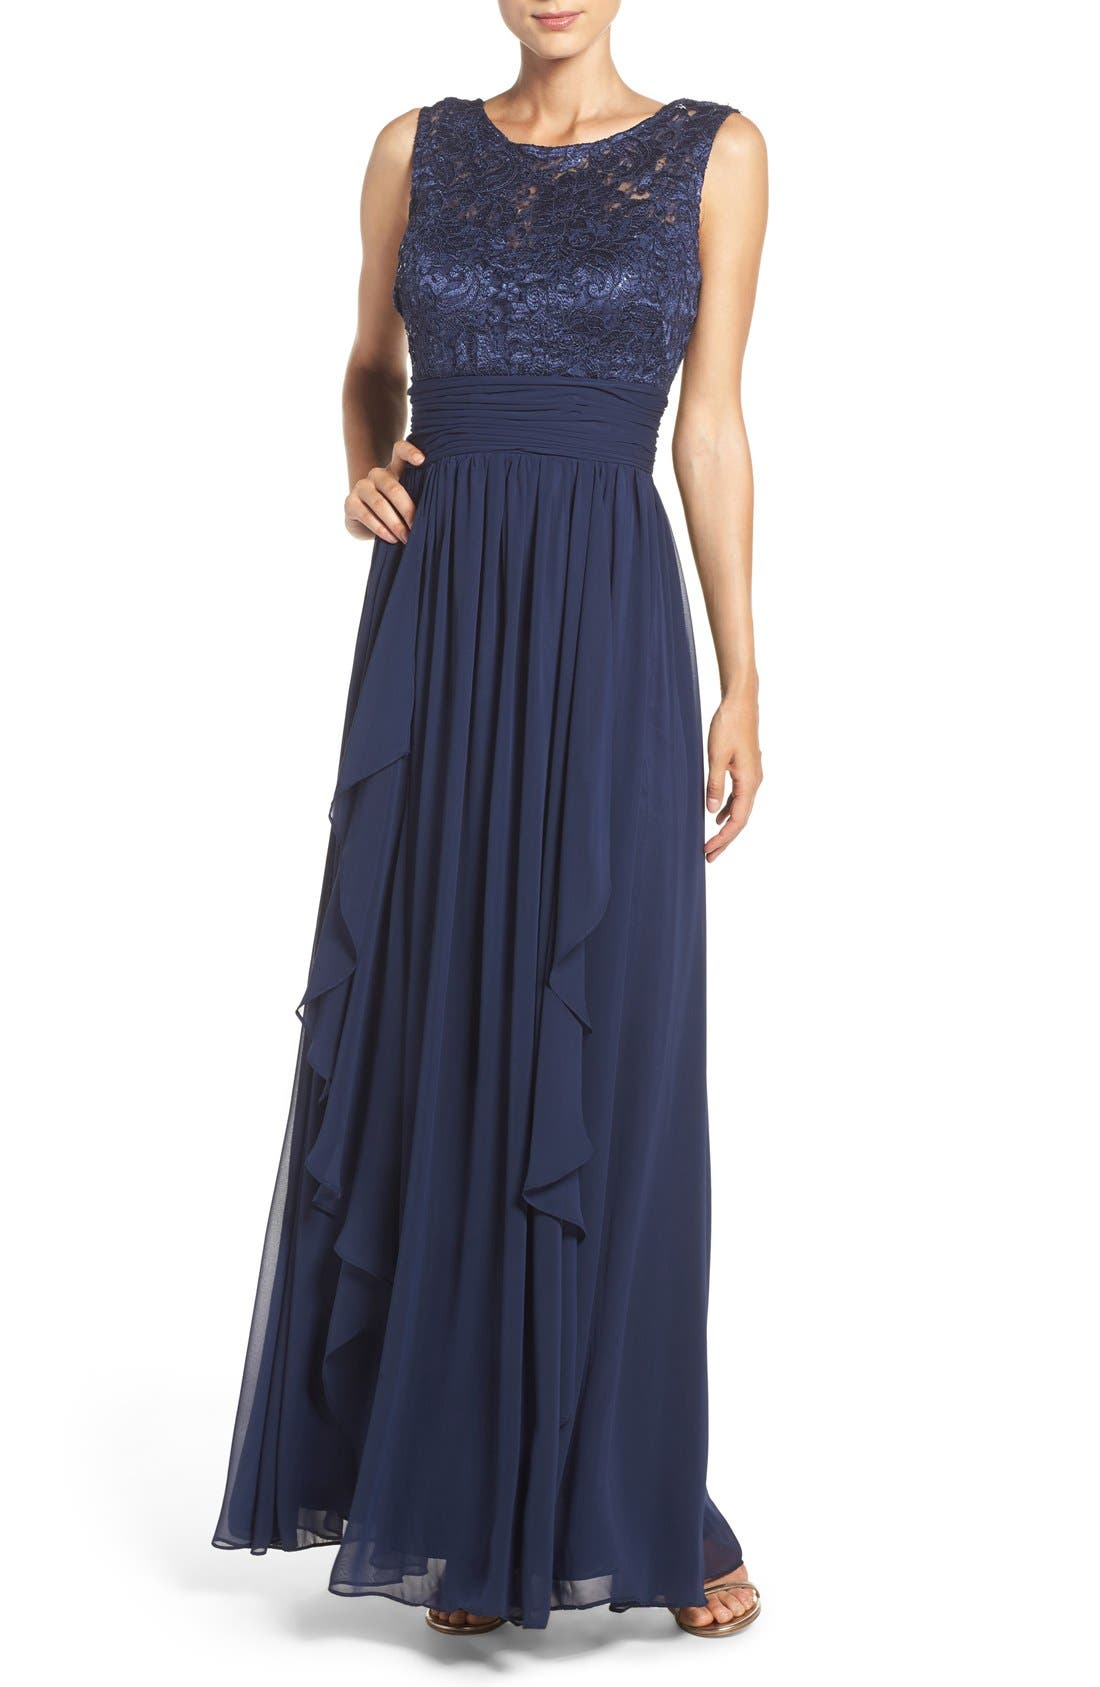 Alternate Image 1 Selected - Eliza J Lace & Chiffon Gown (Regular & Petite)